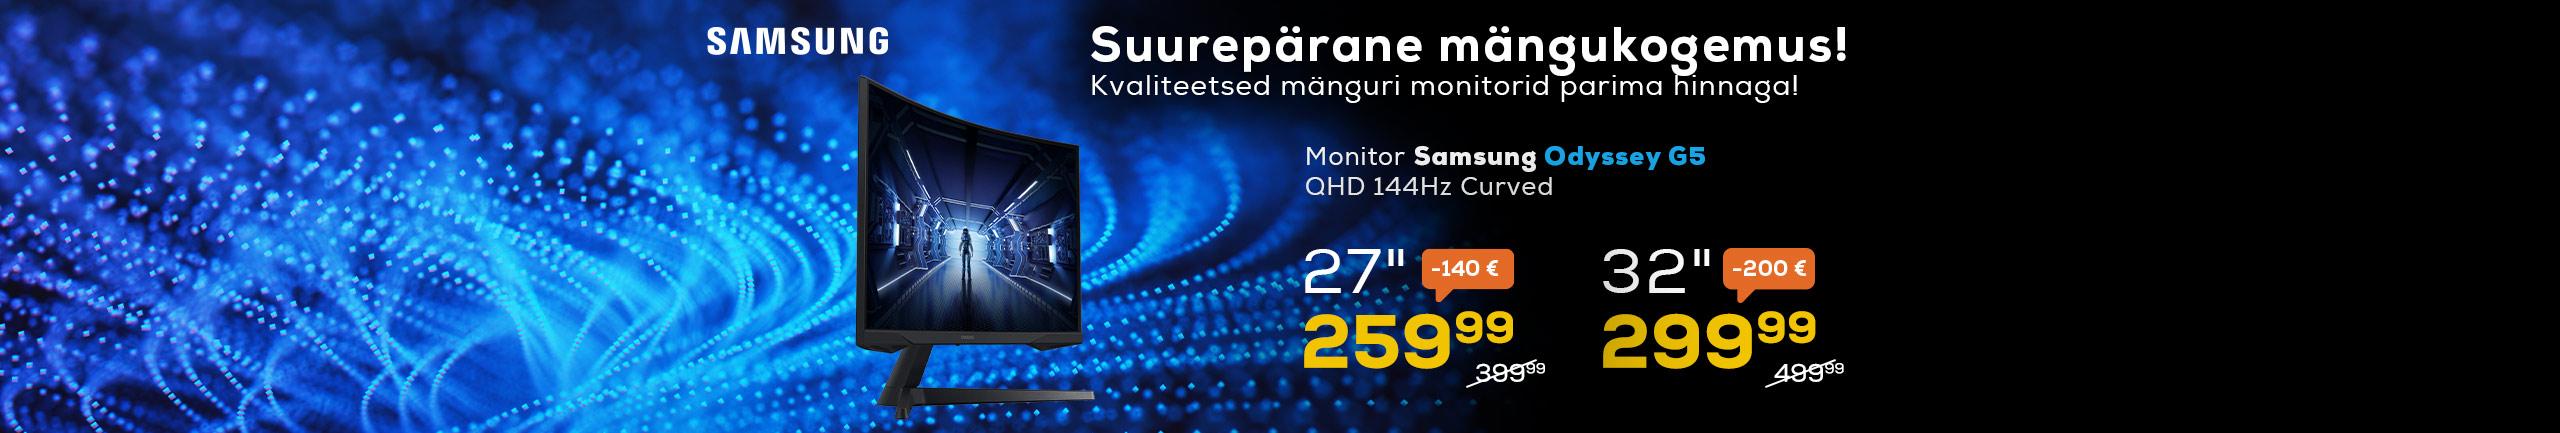 Curved QHD LED VA monitor Samsung Odyssey G5